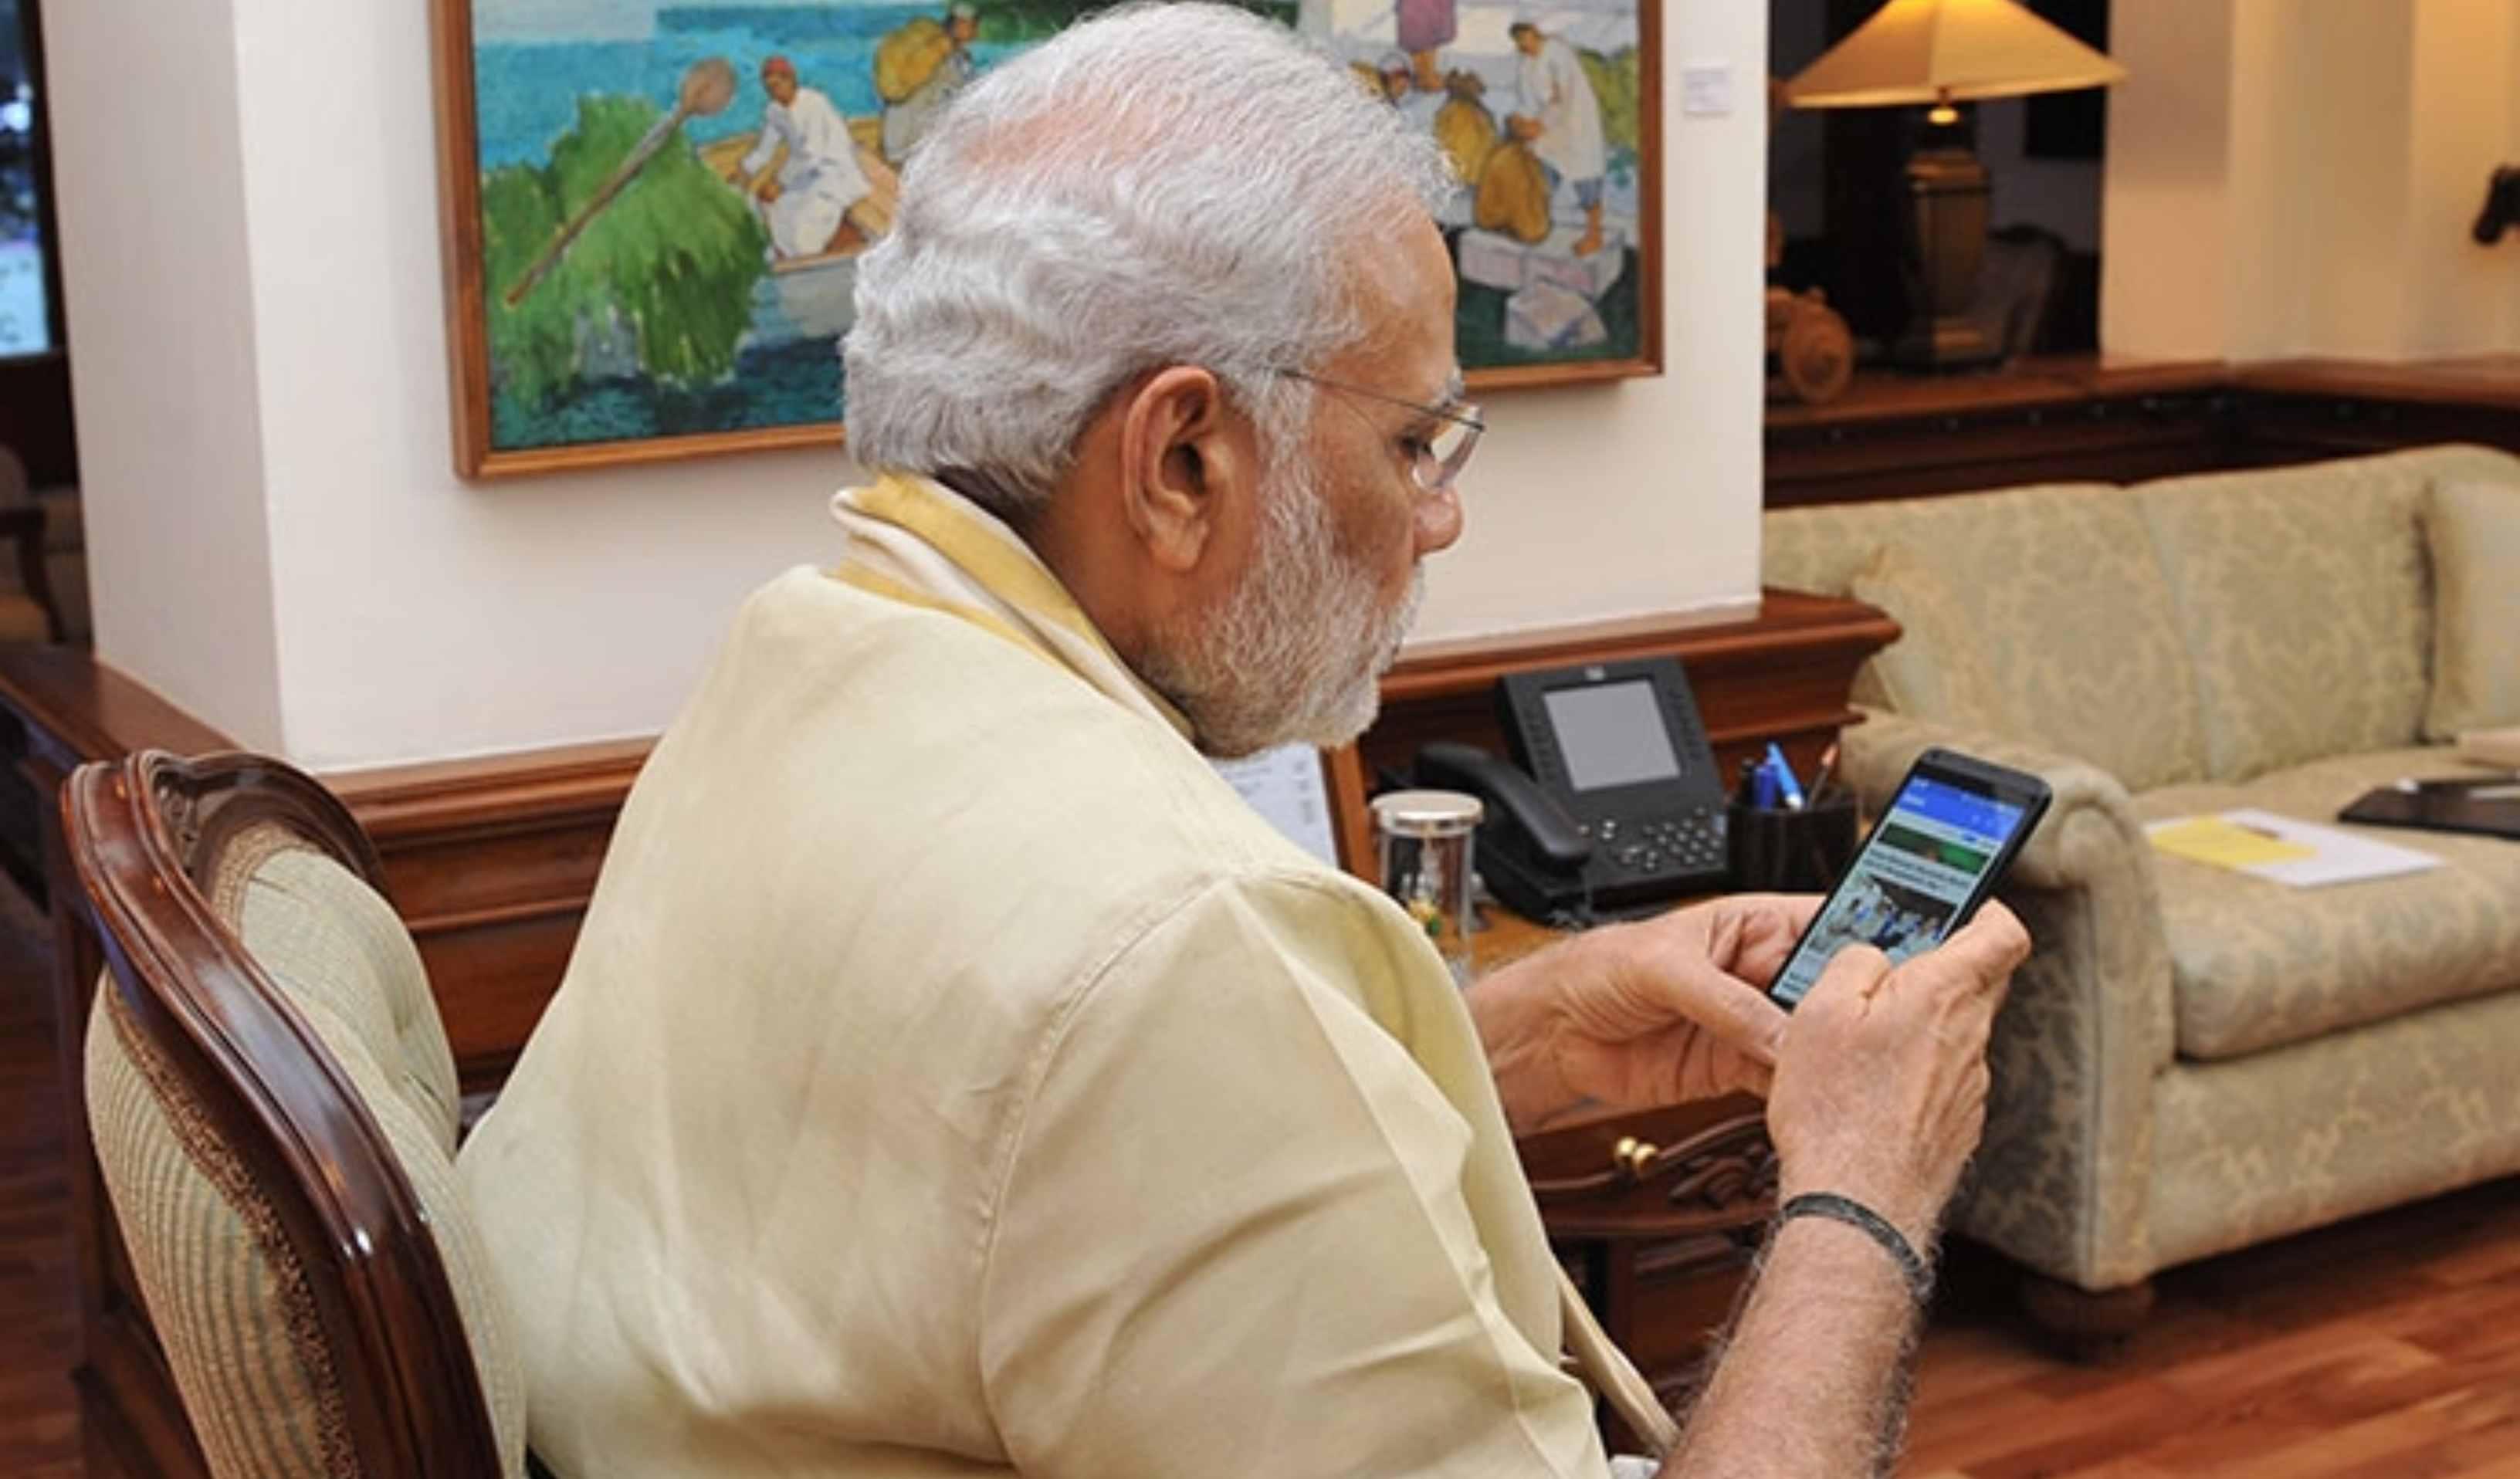 #10YearChallenge, #5YearChallenge, Bharatiya Janata Party, BJP, Congress, Twitter, Trend, NewsMobile, Government, NewsMobile, Mobile, News, India